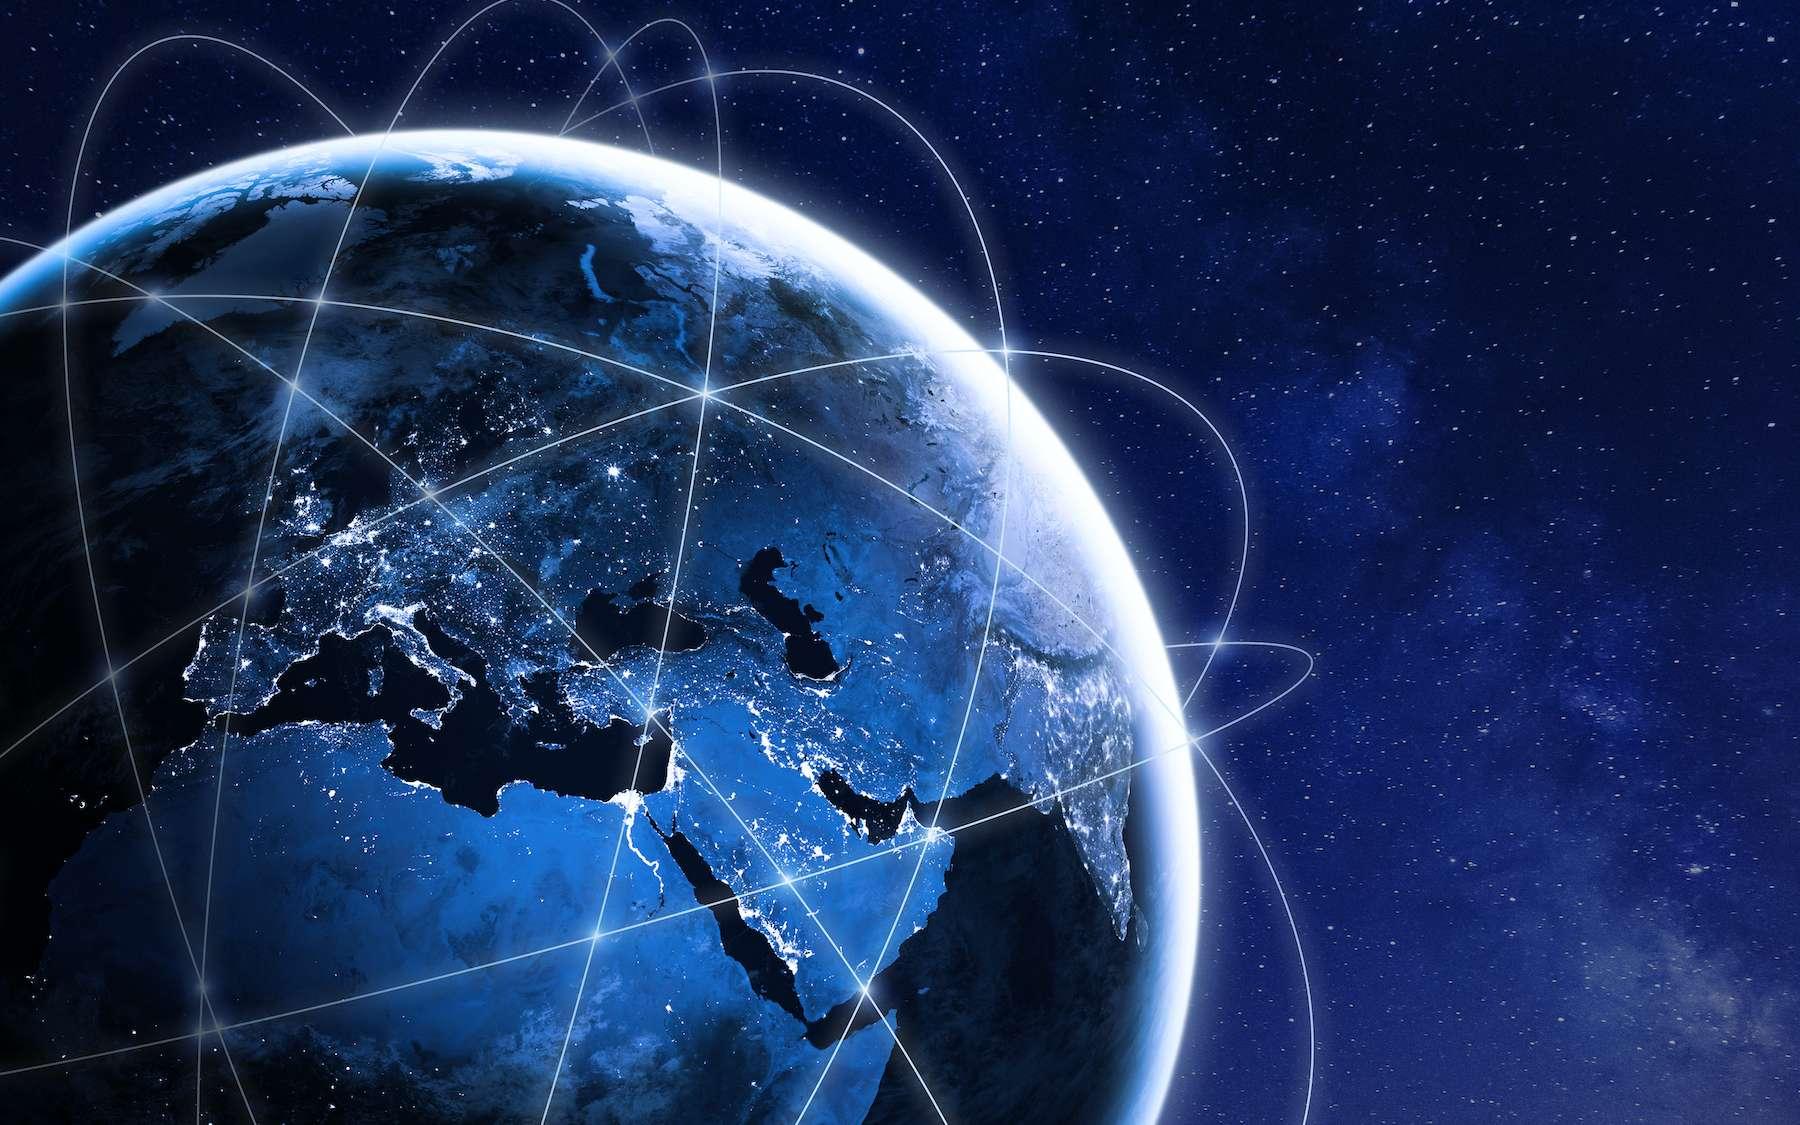 En utilisant les constellations de satellites en orbite basse, on peut déterminer sa position sur Terre. © NicoElNino, Adobe Stock